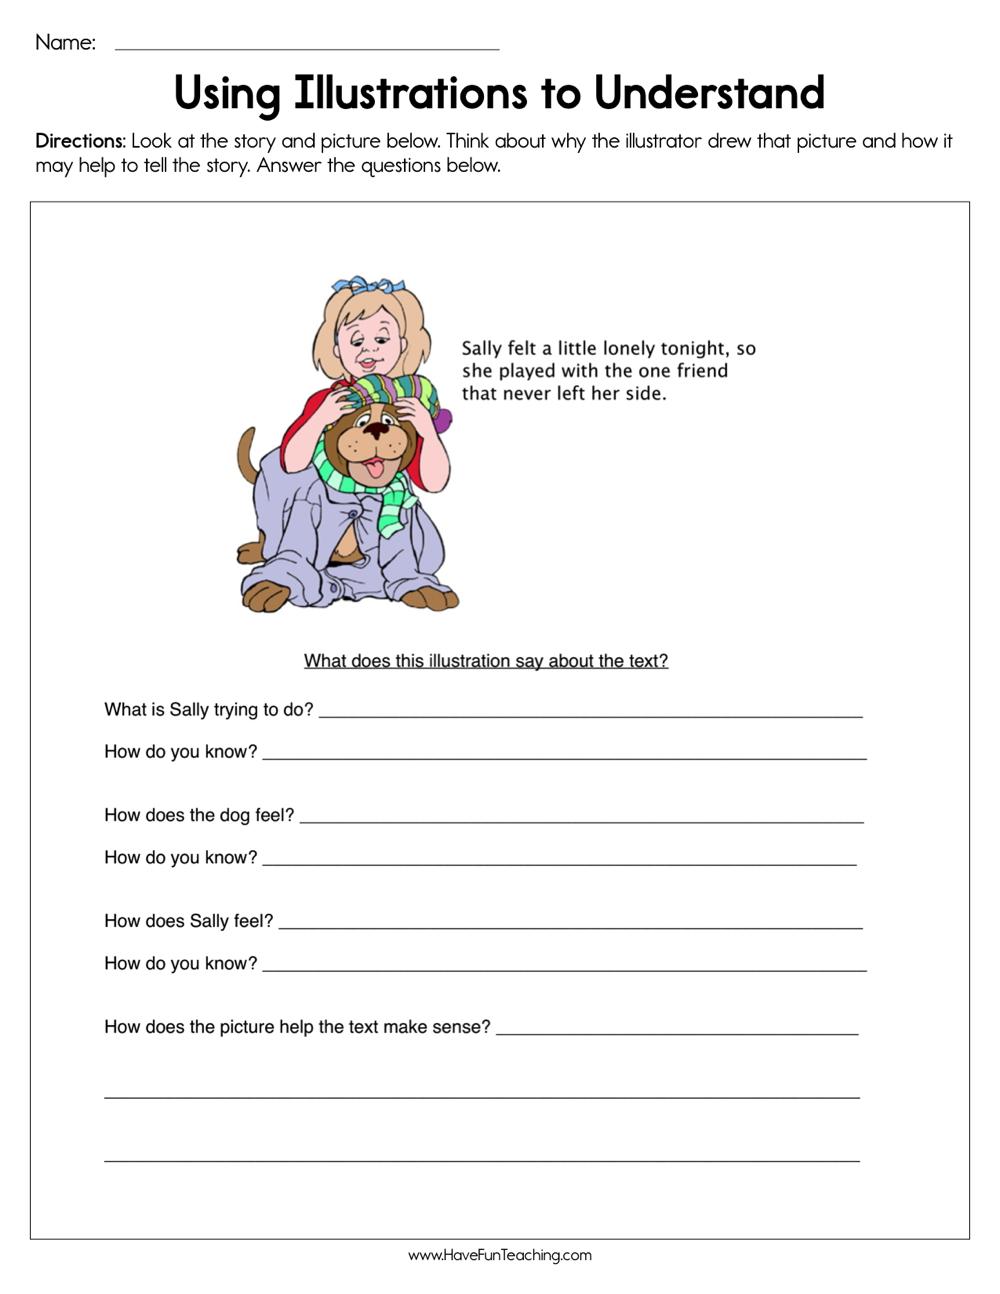 medium resolution of Using Illustrations to Understand Worksheet • Have Fun Teaching